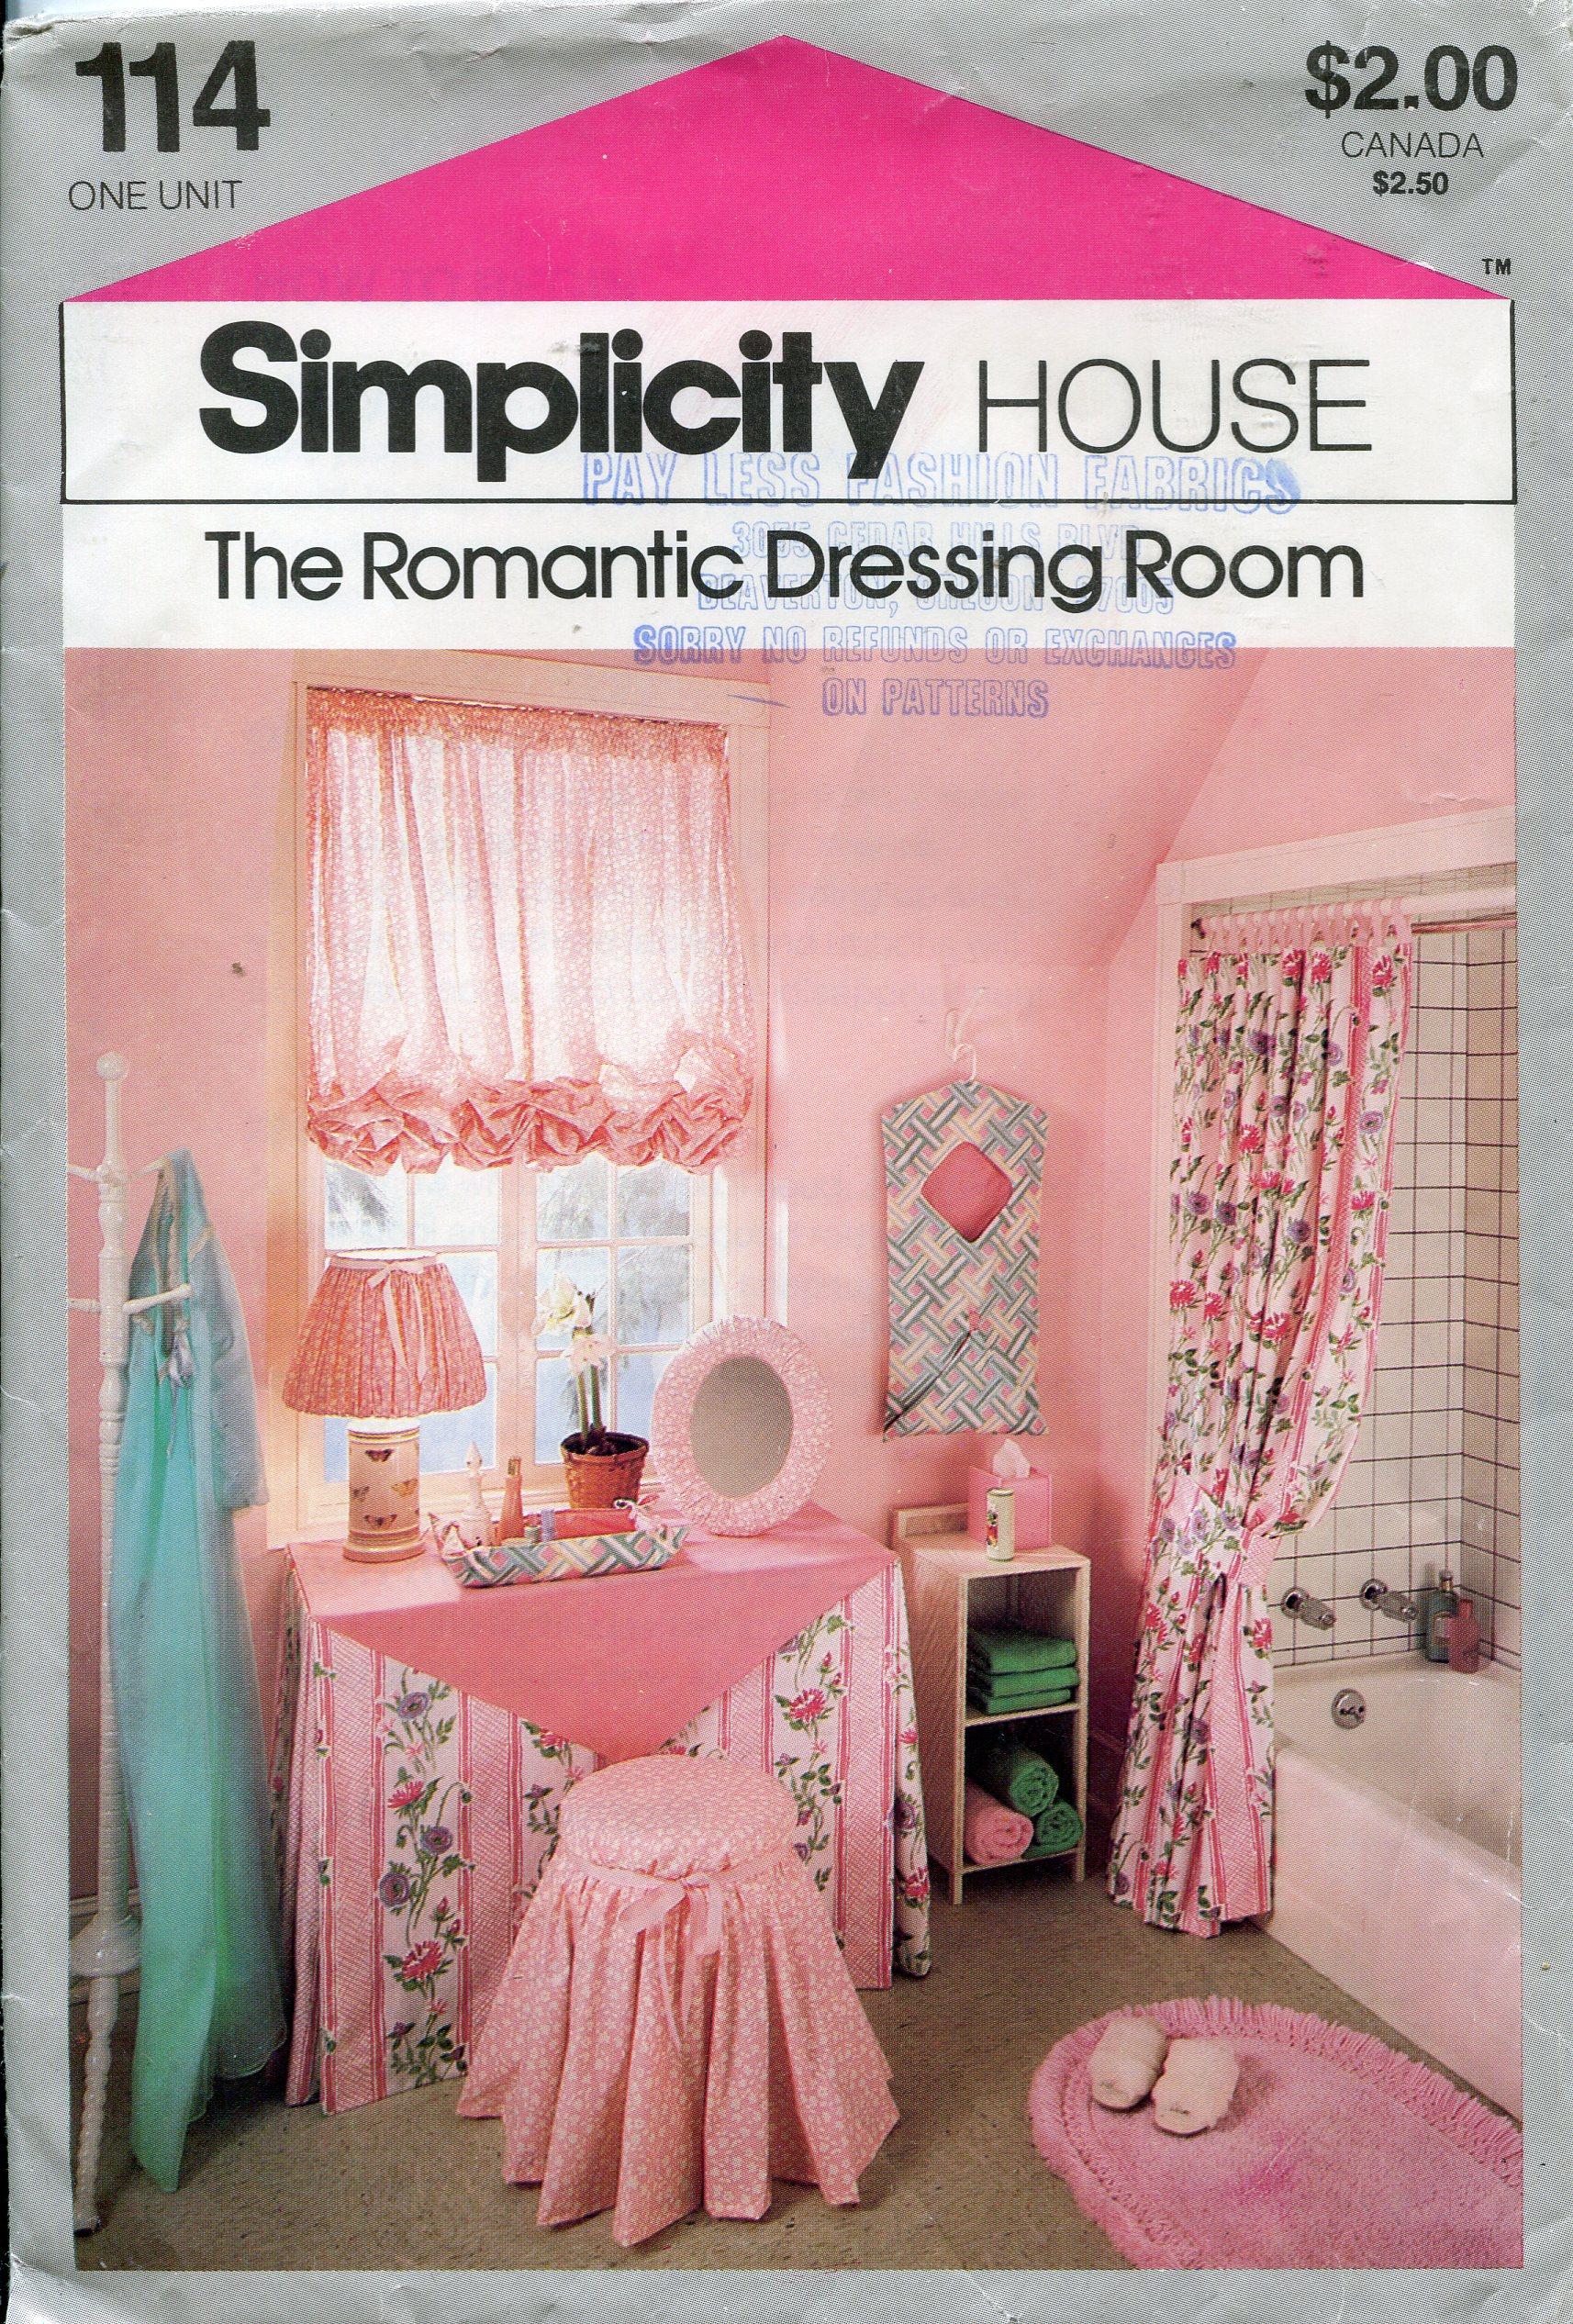 Simplicity 114